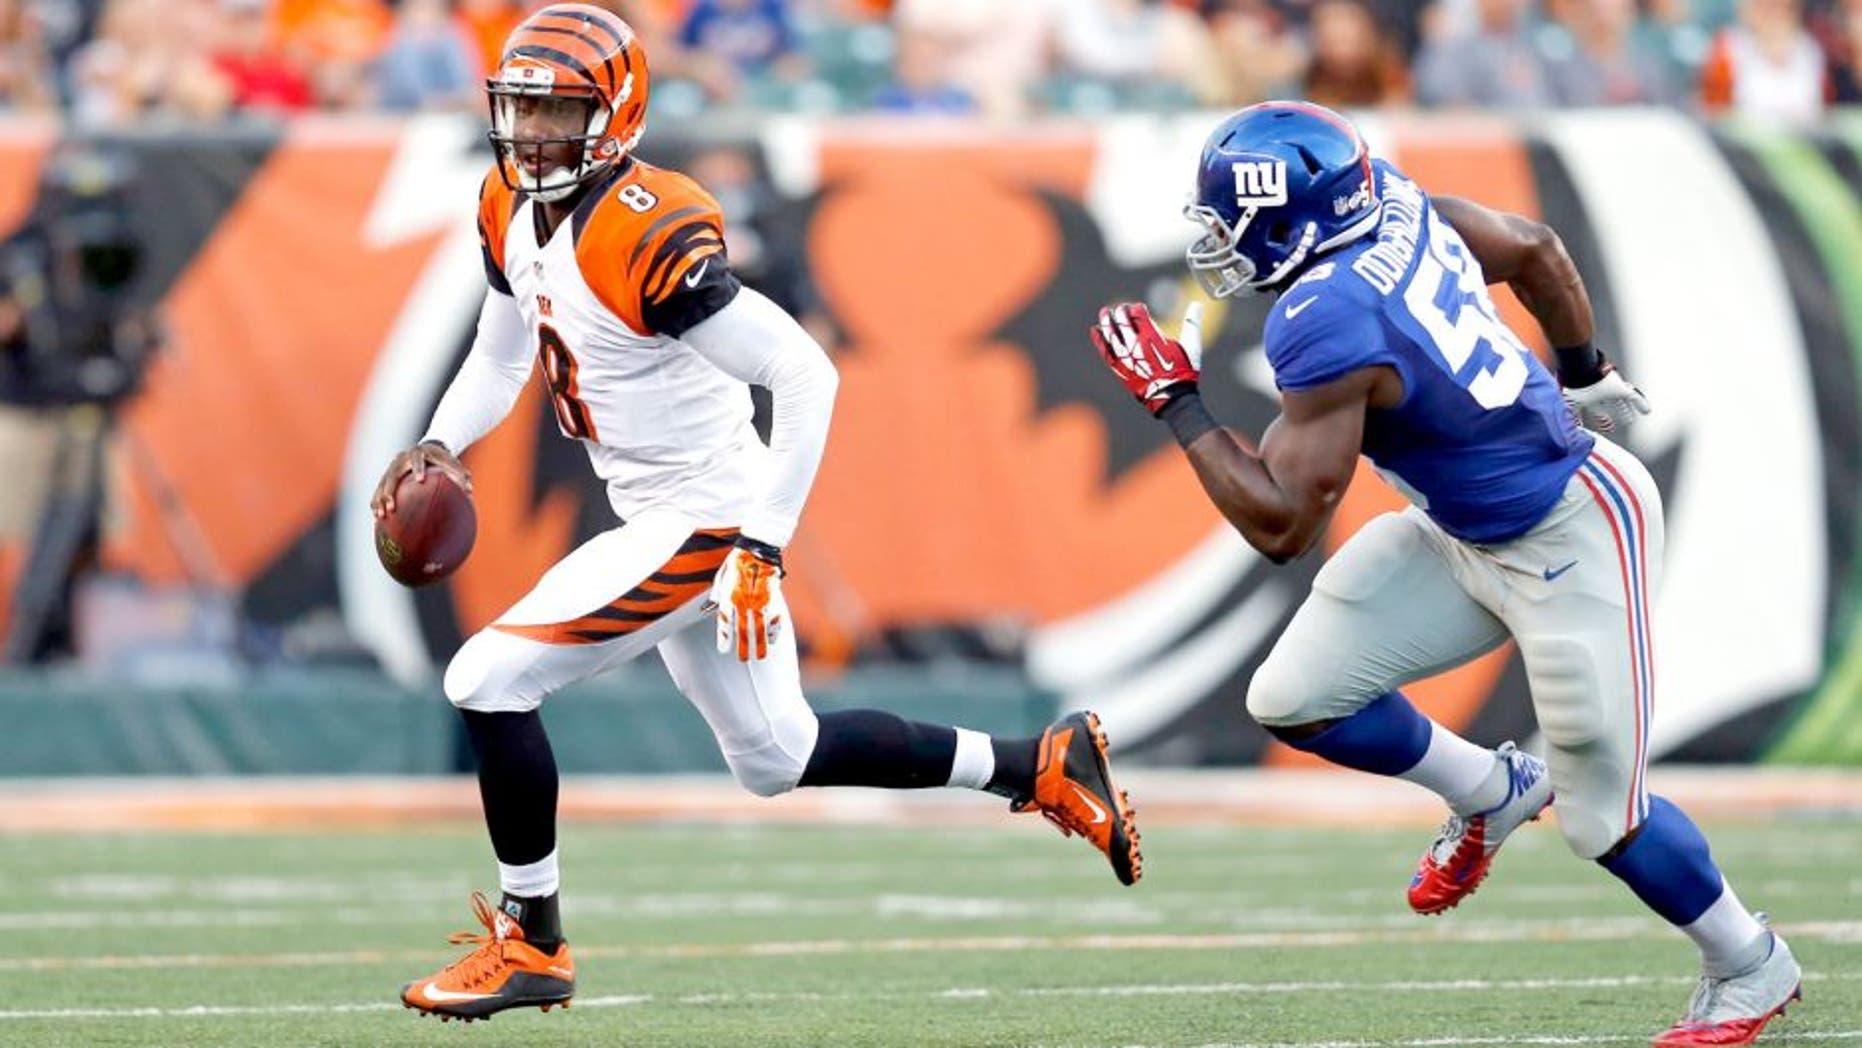 New York Giants defensive end Owamagbe Odighizuwa (58) chases Cincinnati Bengals quarterback Josh Johnson during the first half of an NFL preseason football game in Cincinnati, Friday, Aug. 14, 2015. (AP Photo/Gary Landers)